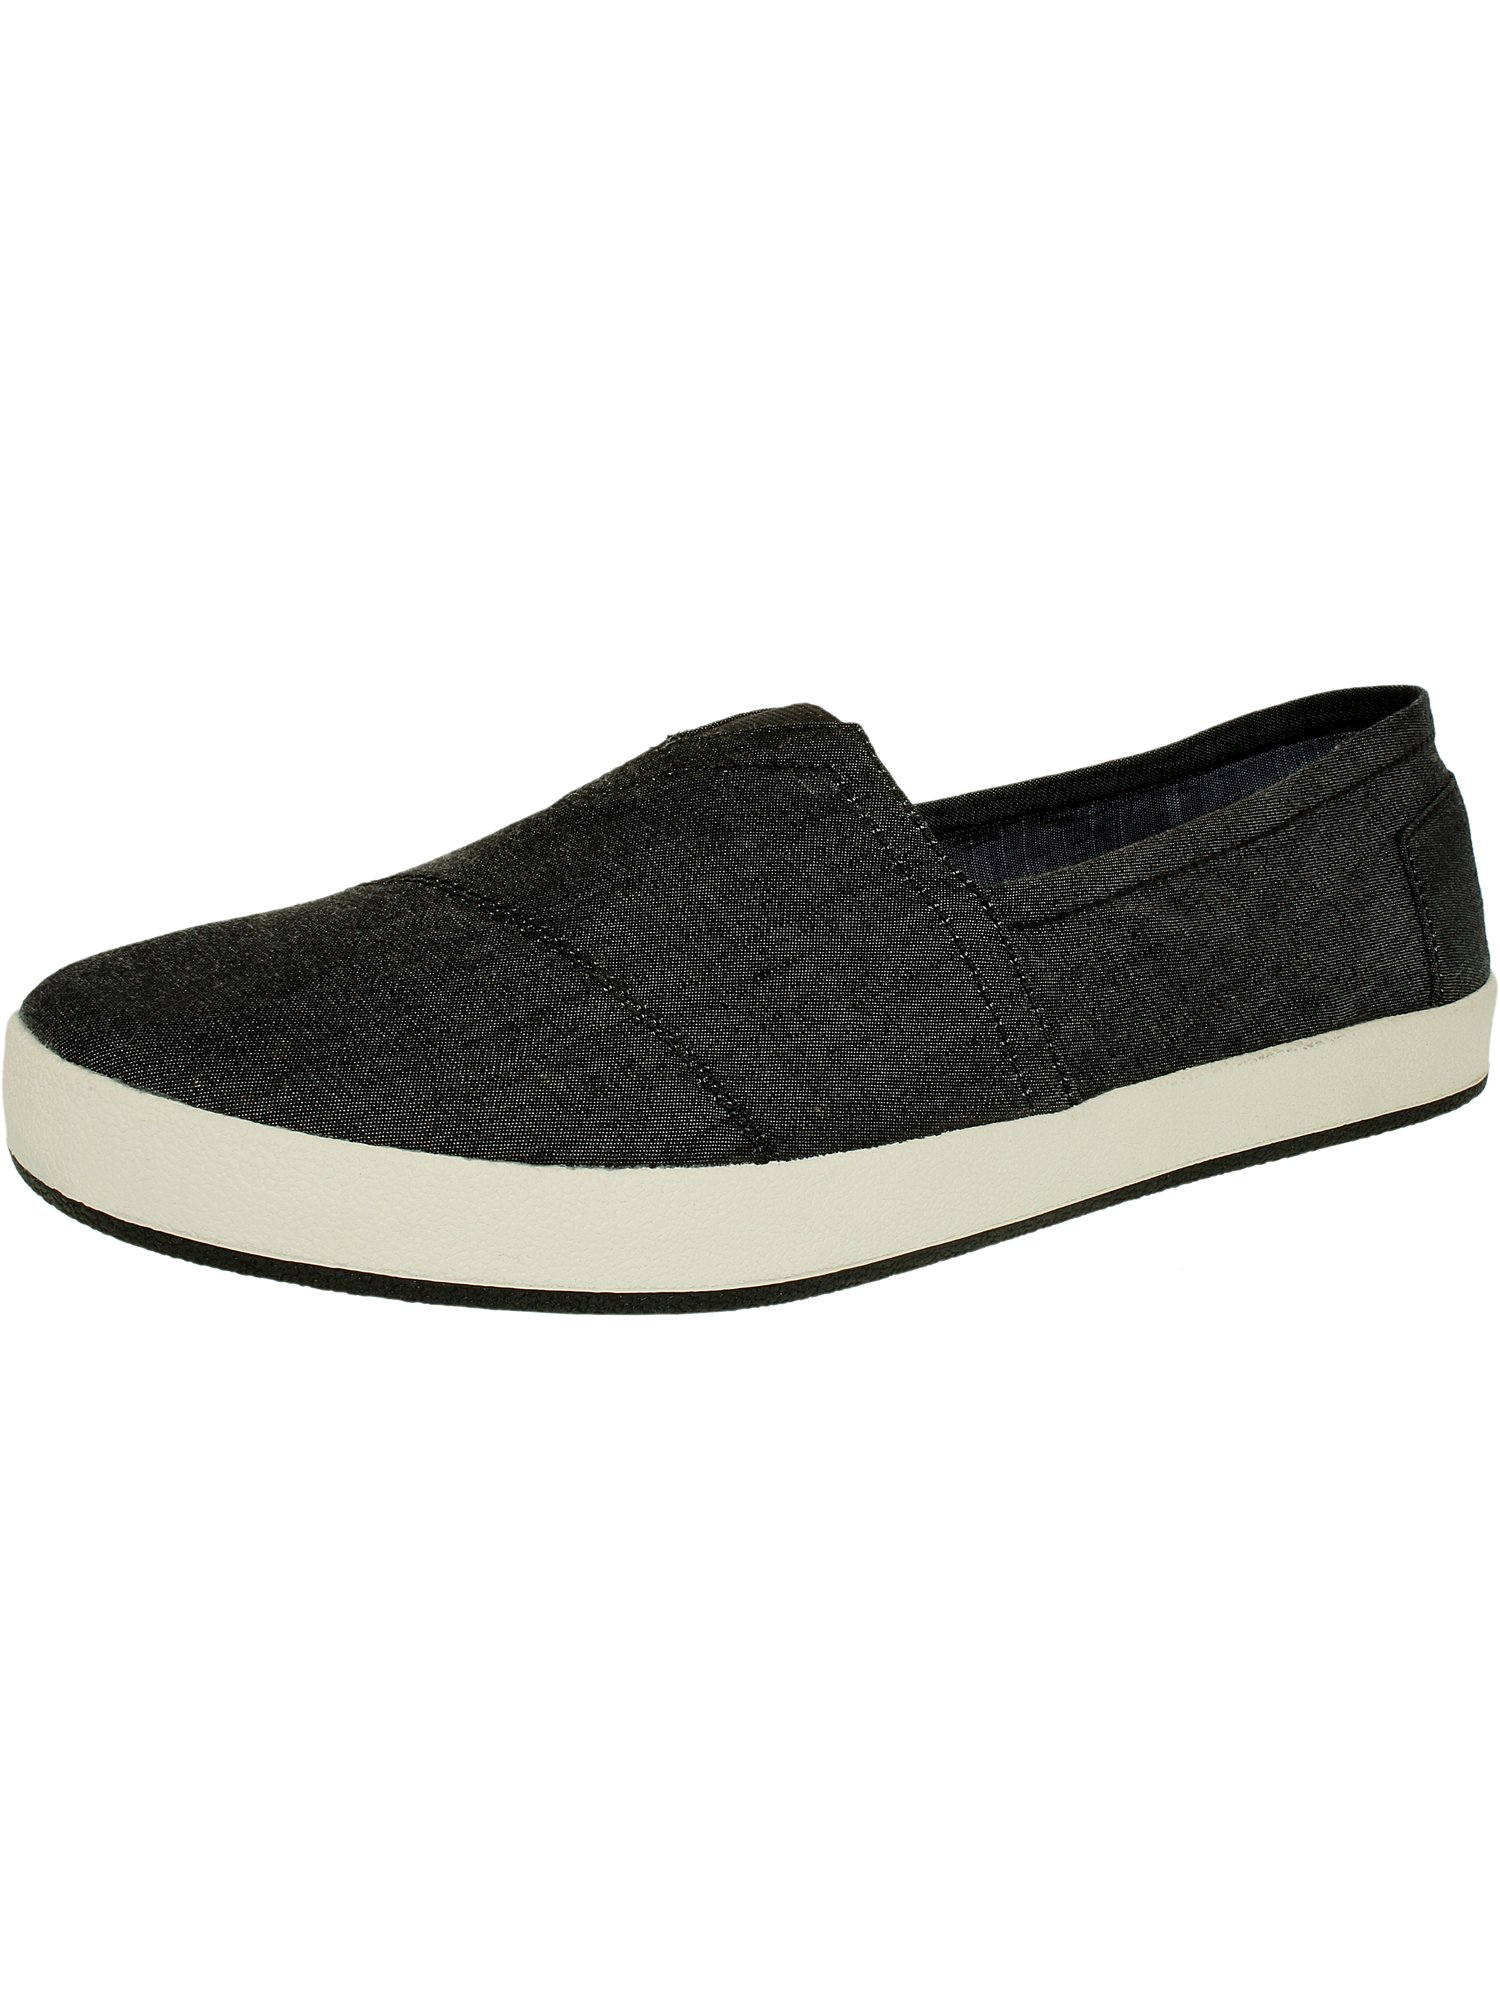 7c26f3f190f Toms Men s Avalon Slipon Chambray Black Ankle-High Fabric Flat Shoe - 8.5M